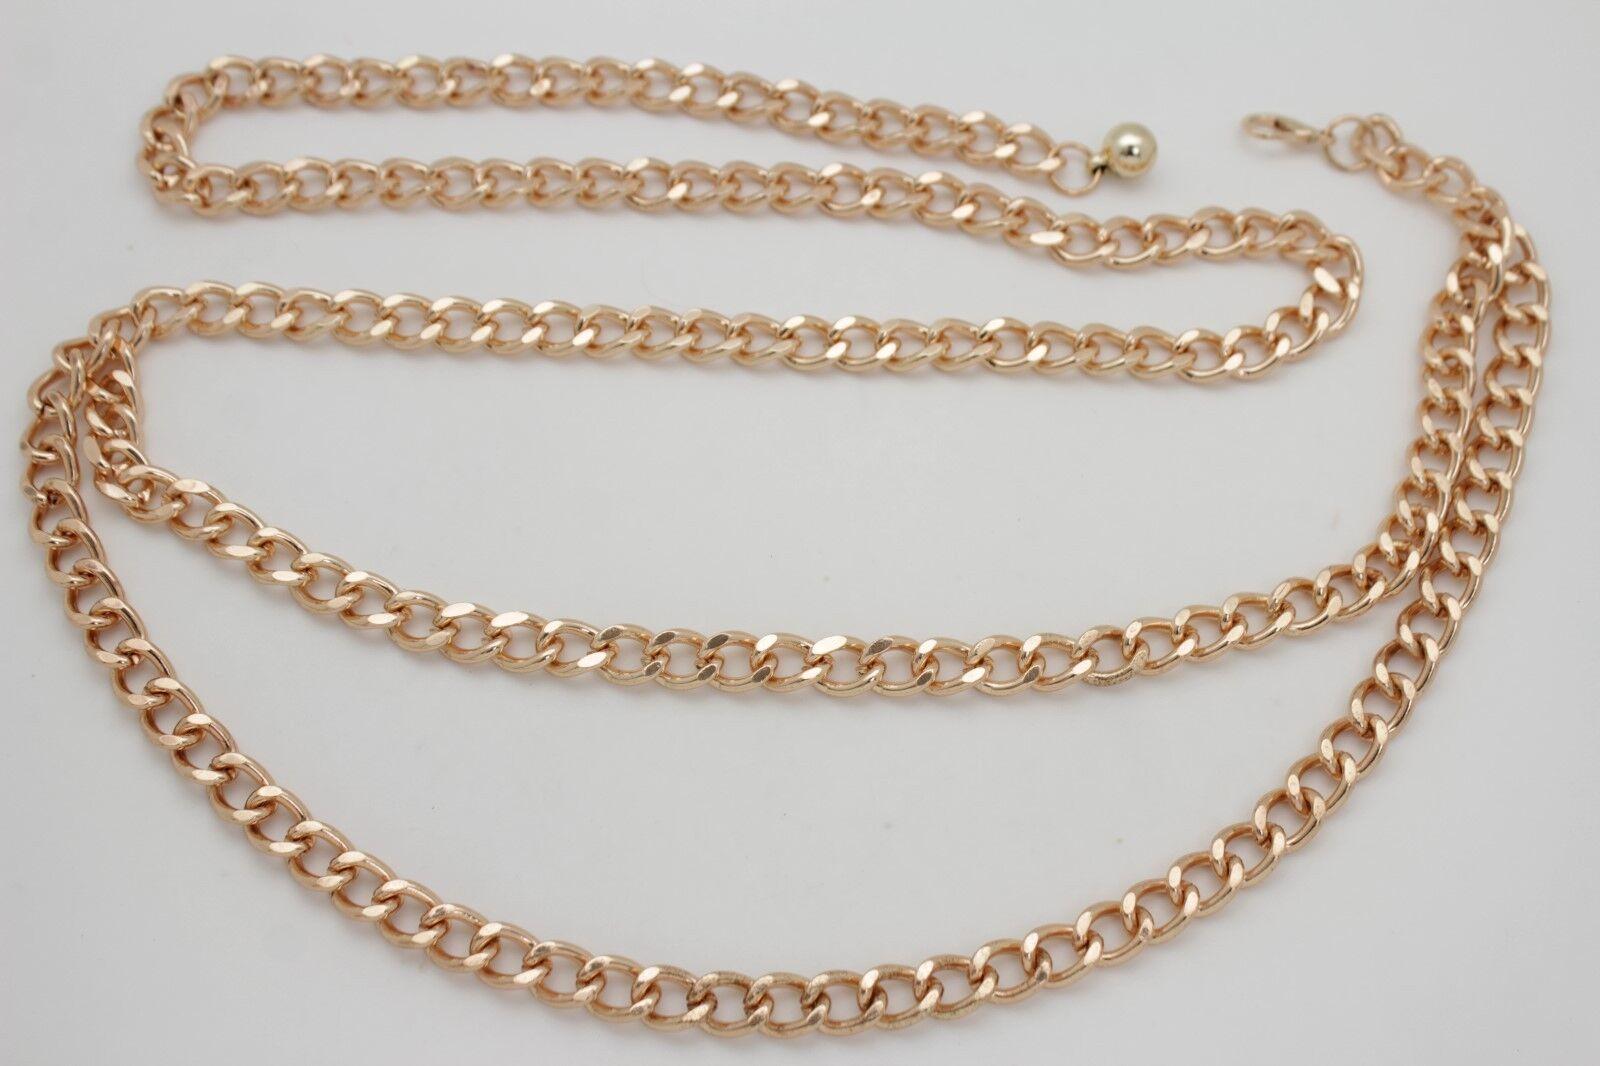 Women Metallic Gold Metal Chain Link Fancy Fashion Party Look Belt Size M L XL